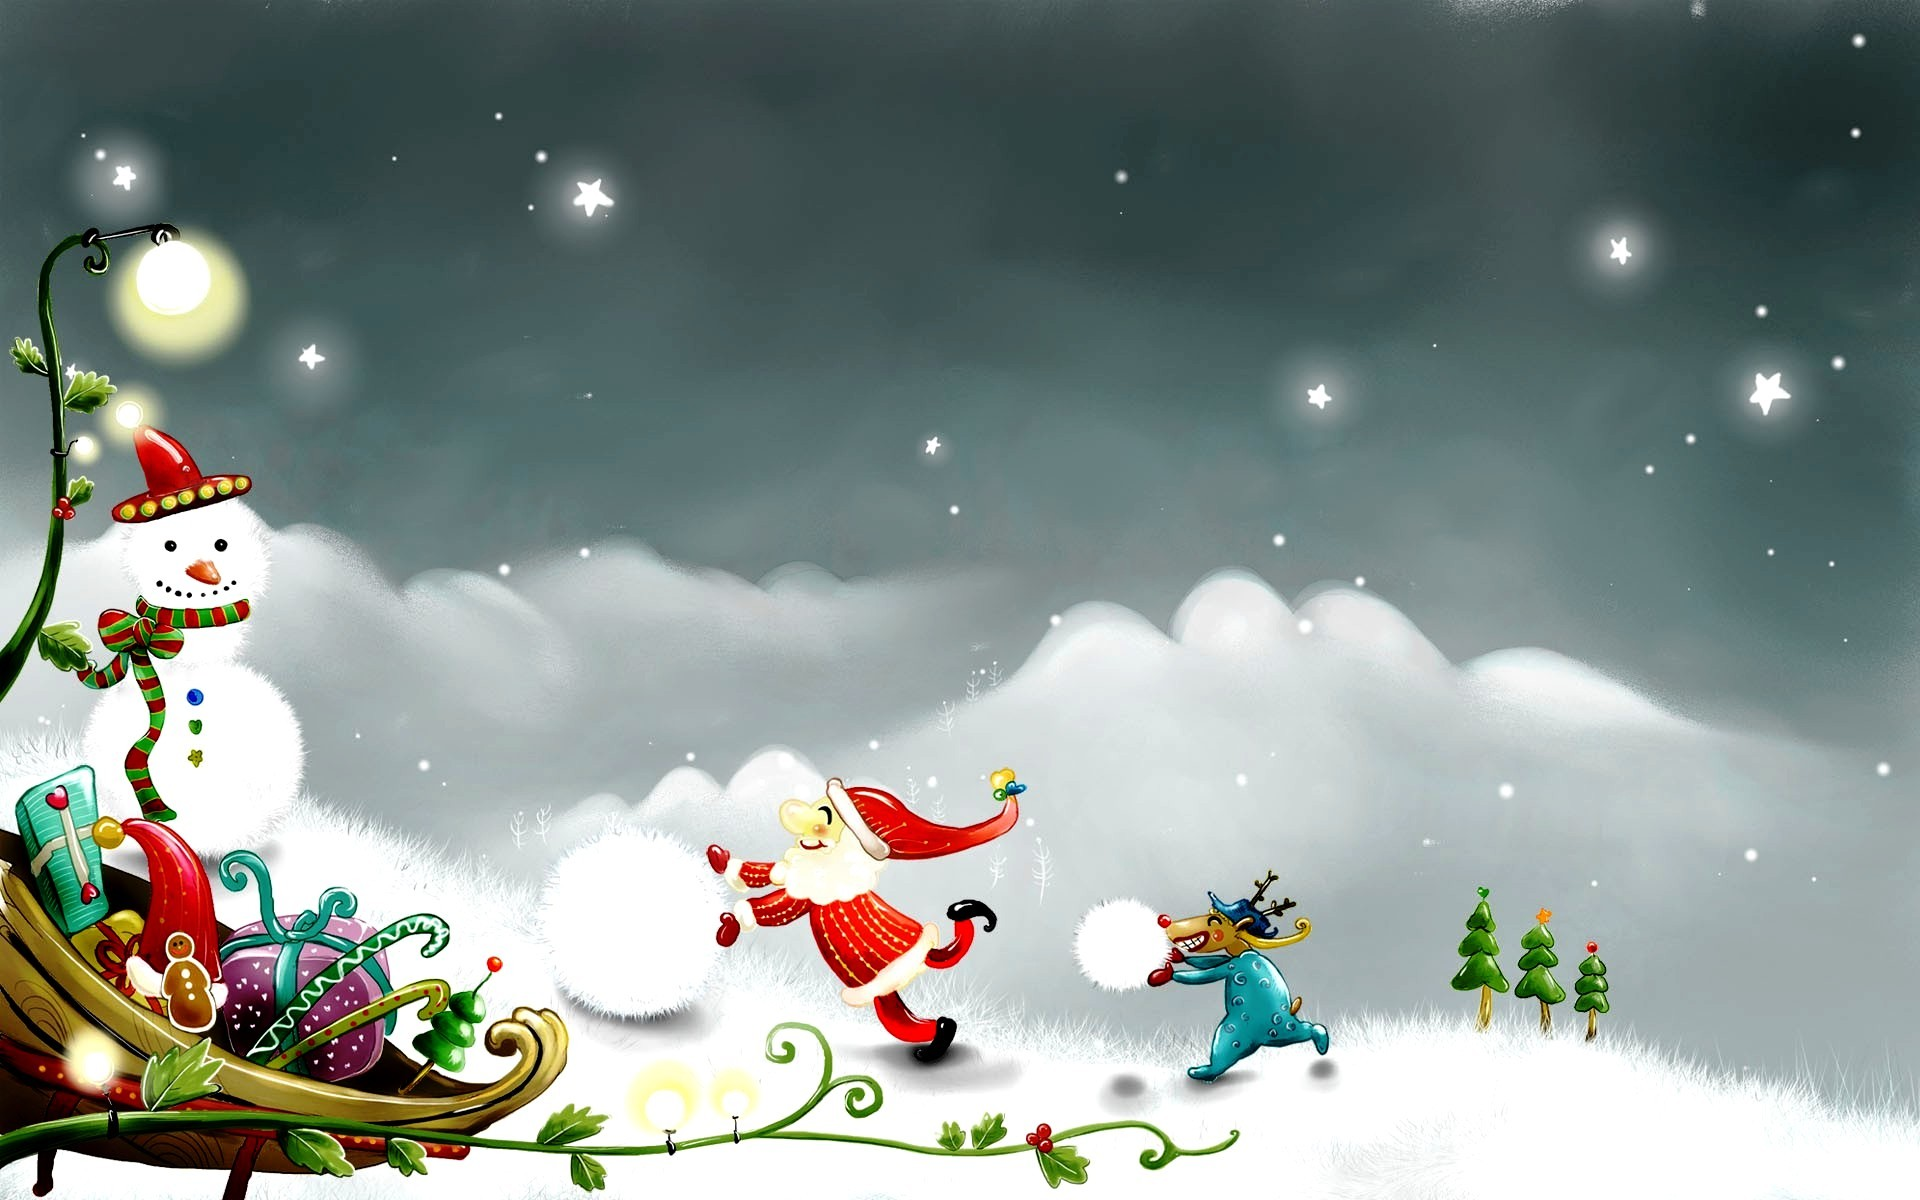 Free Download Winter Christmas Wallpaper.